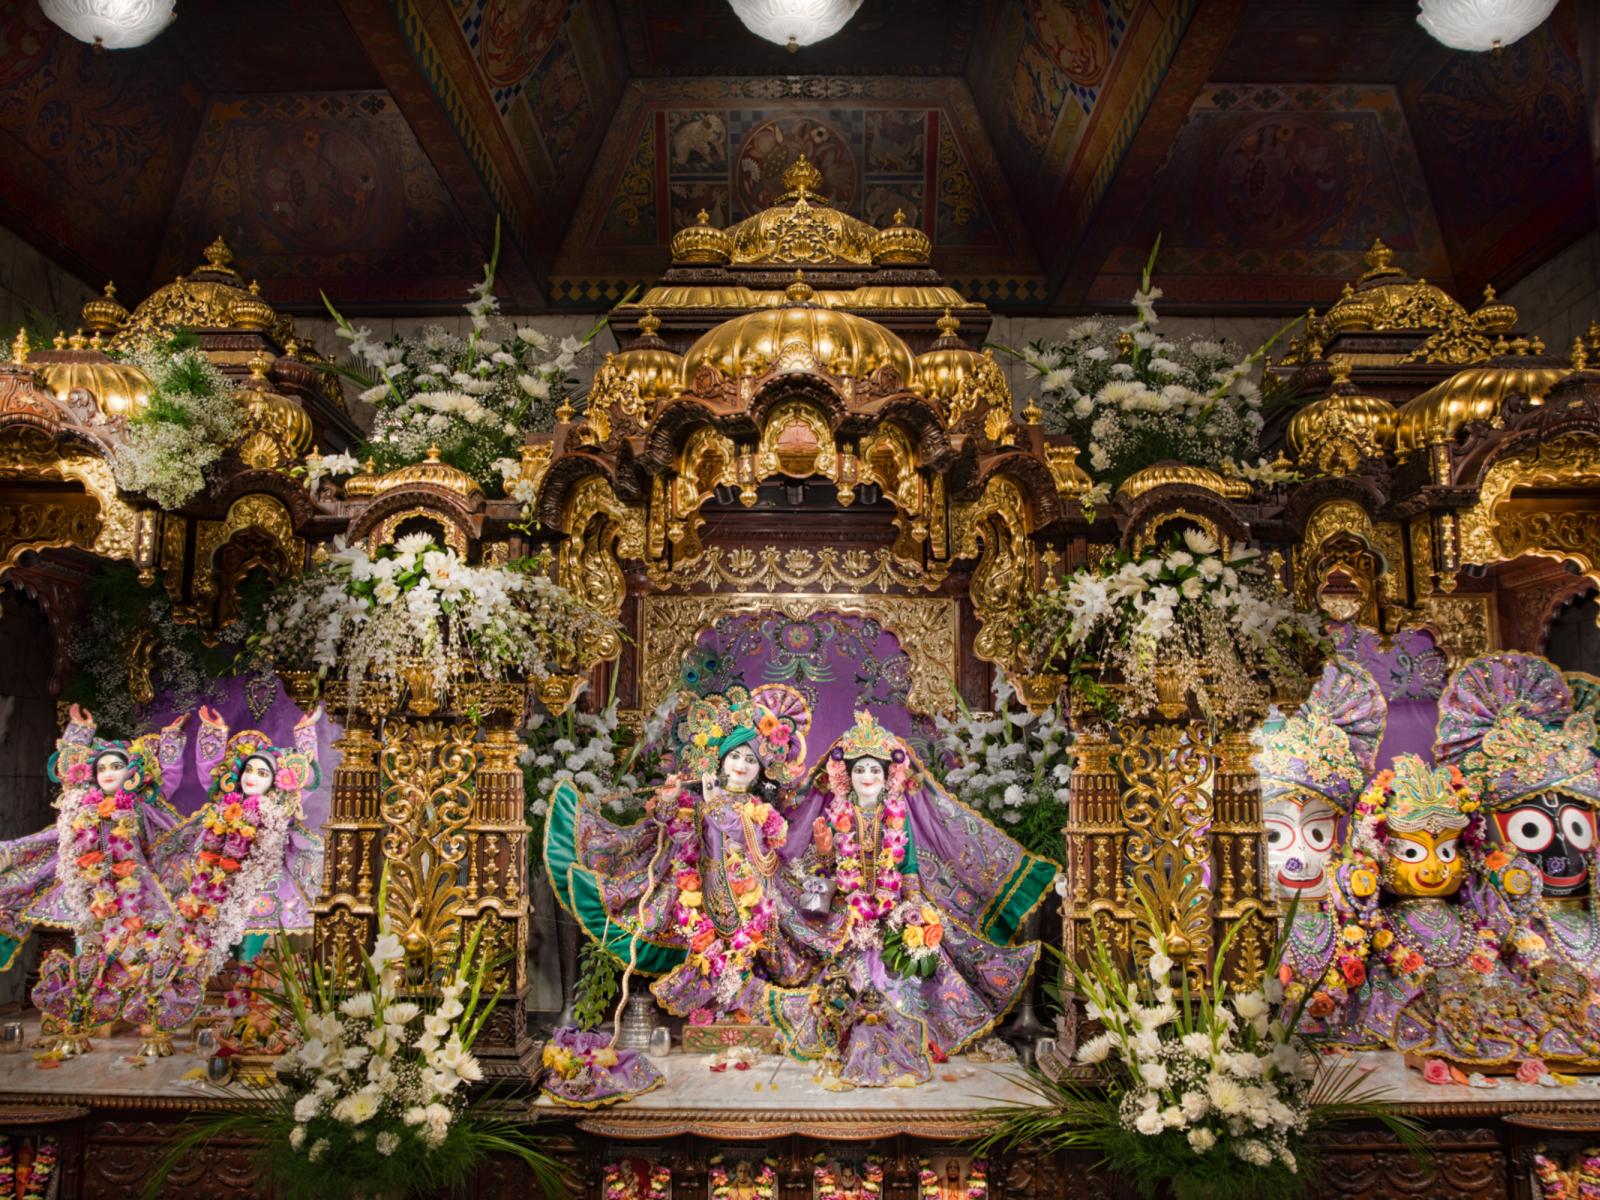 Hare Krishna Temple Los Angeles